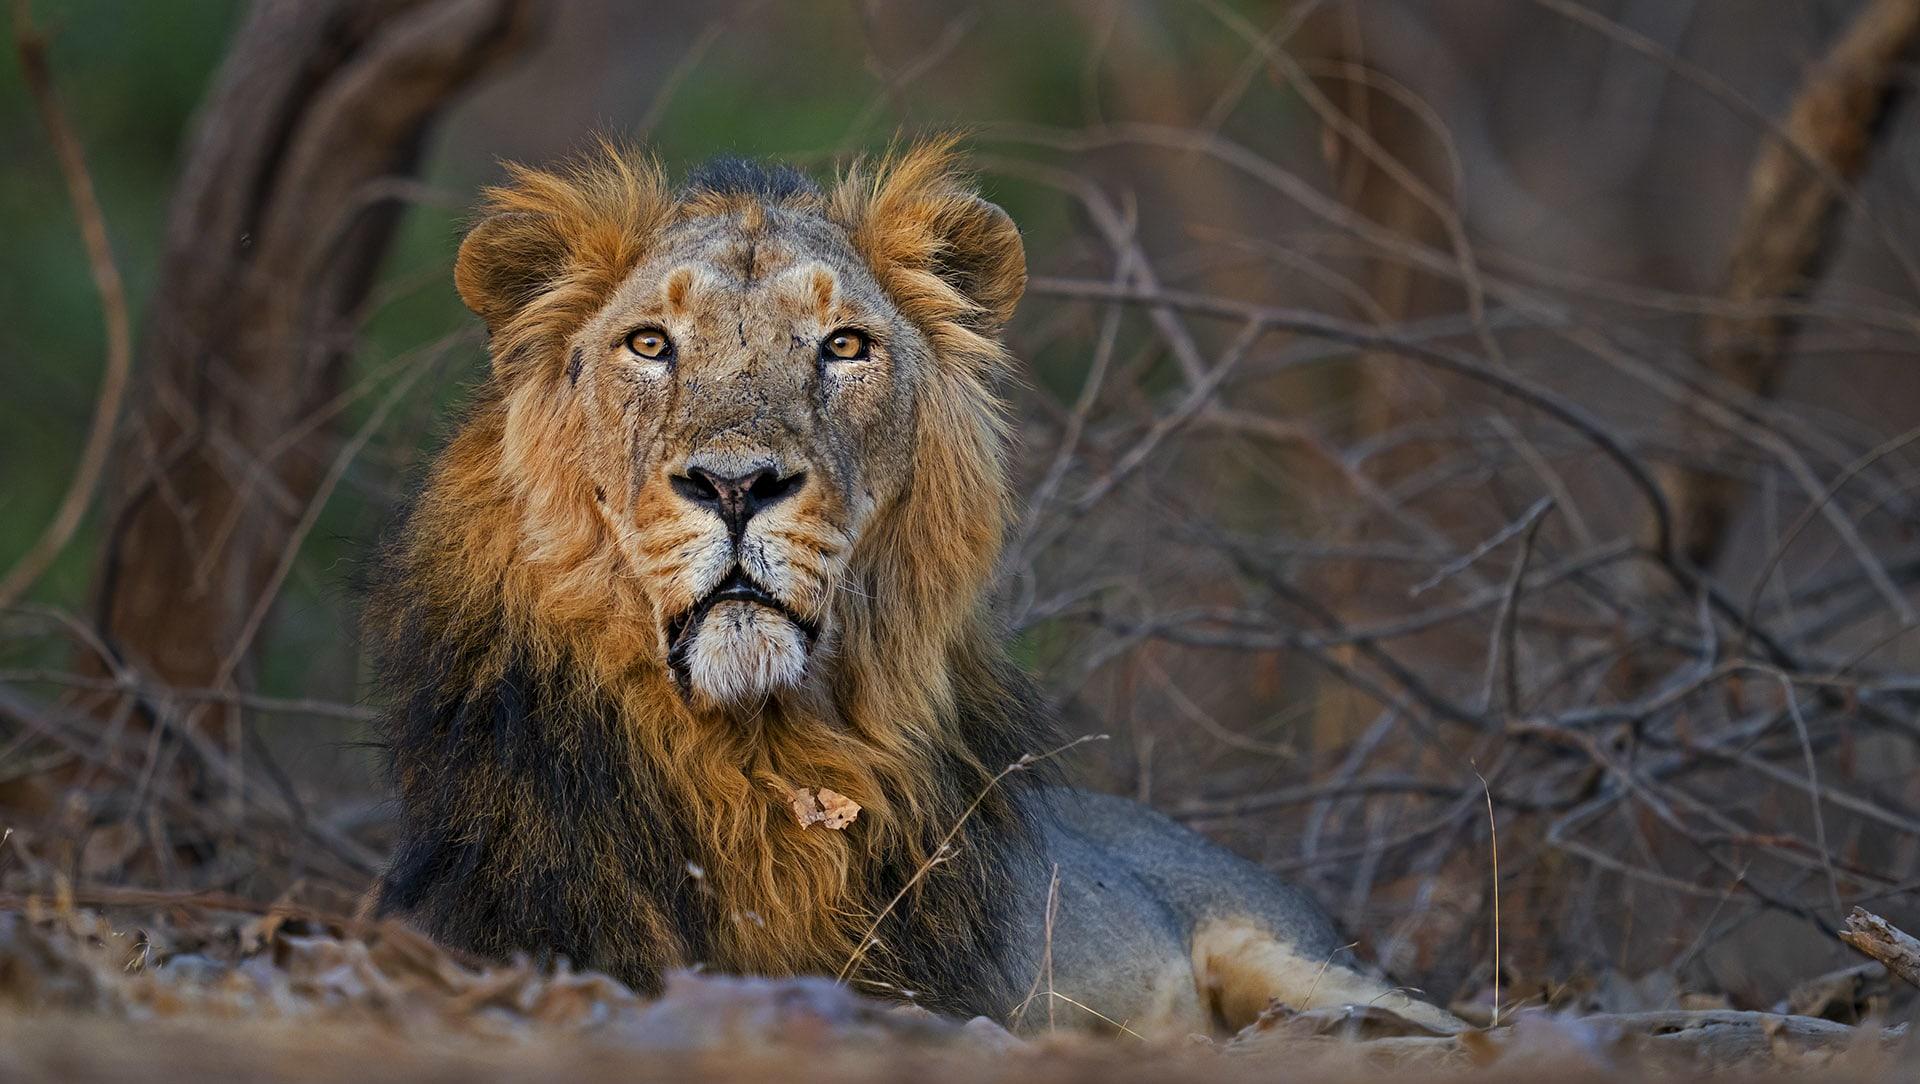 The Guide: Gir National Park